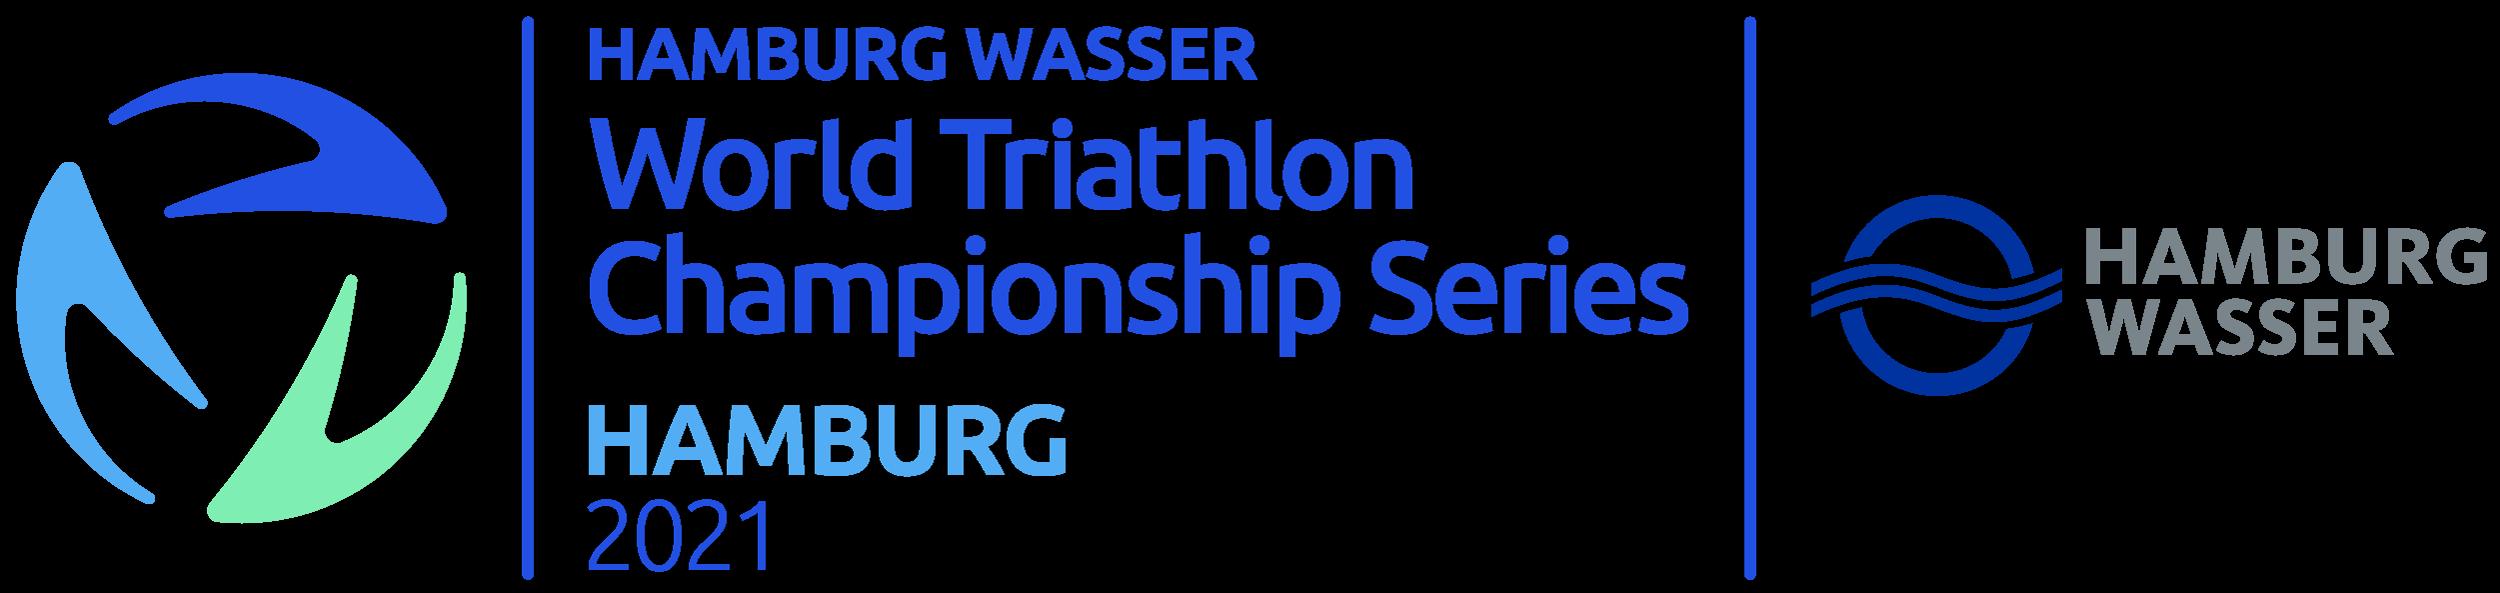 HAMBURG WASSER World Triathlon Championship Series Hamburg logo